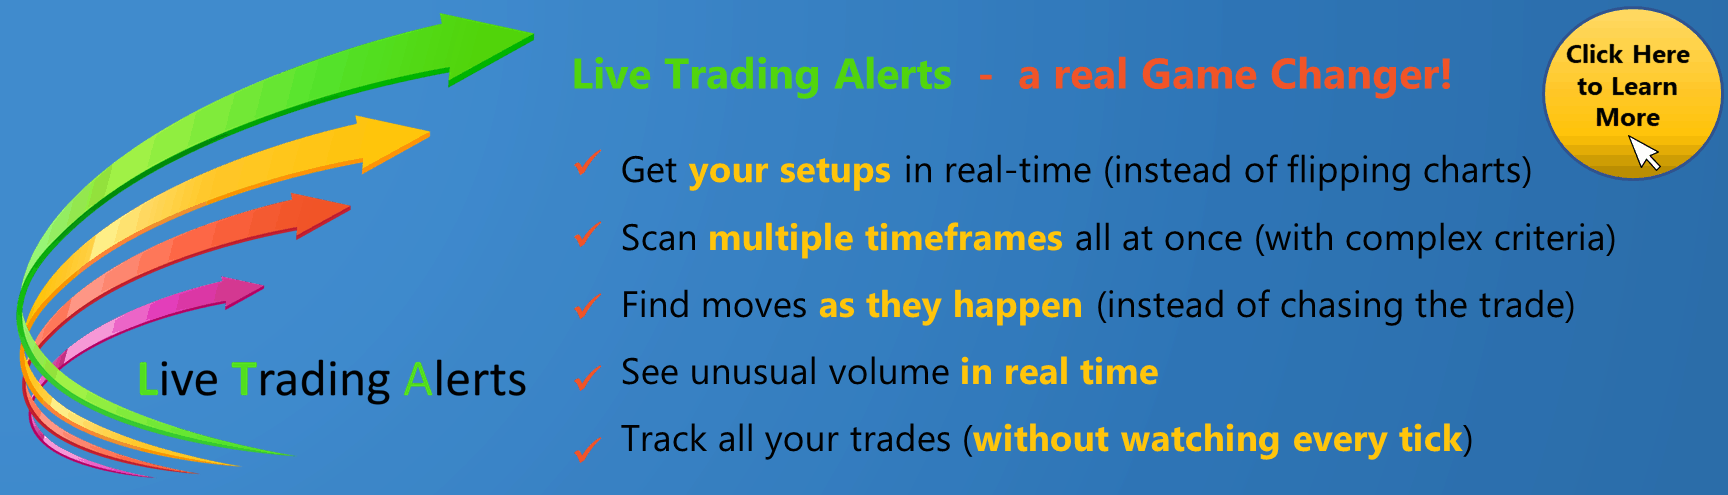 Live Trading Alerts